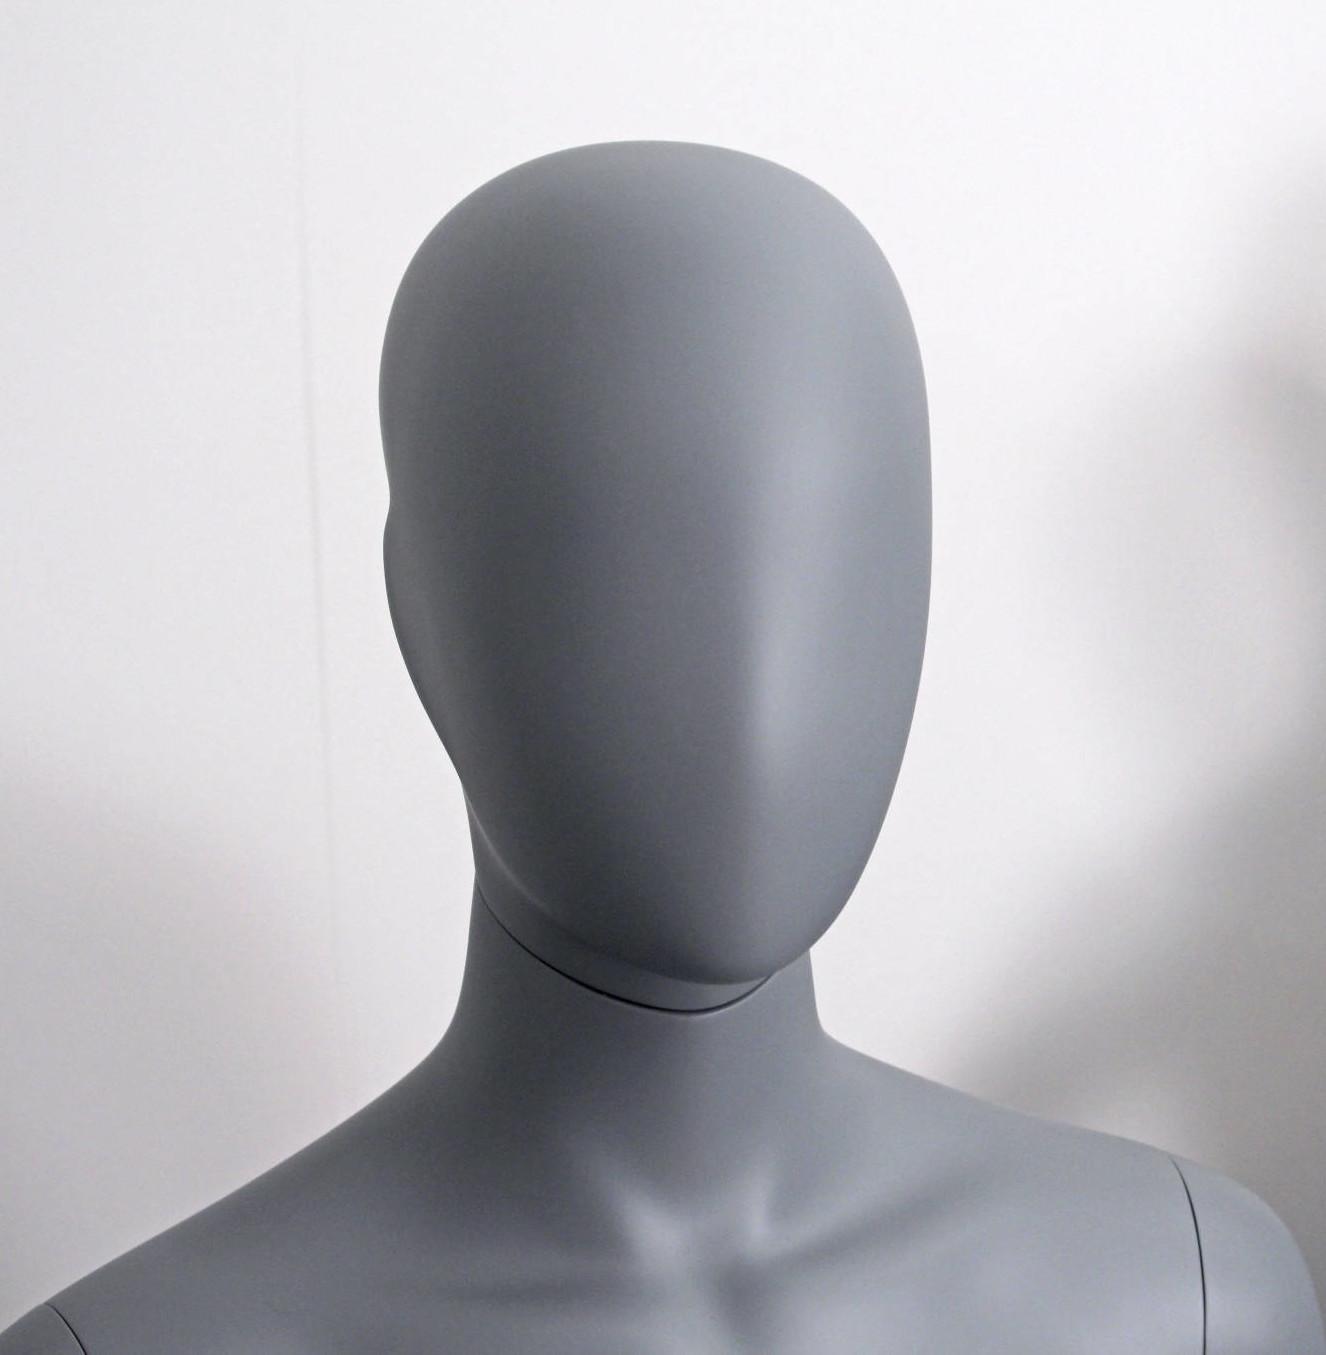 Sophia Grey moon mannequin - faceless mannequin